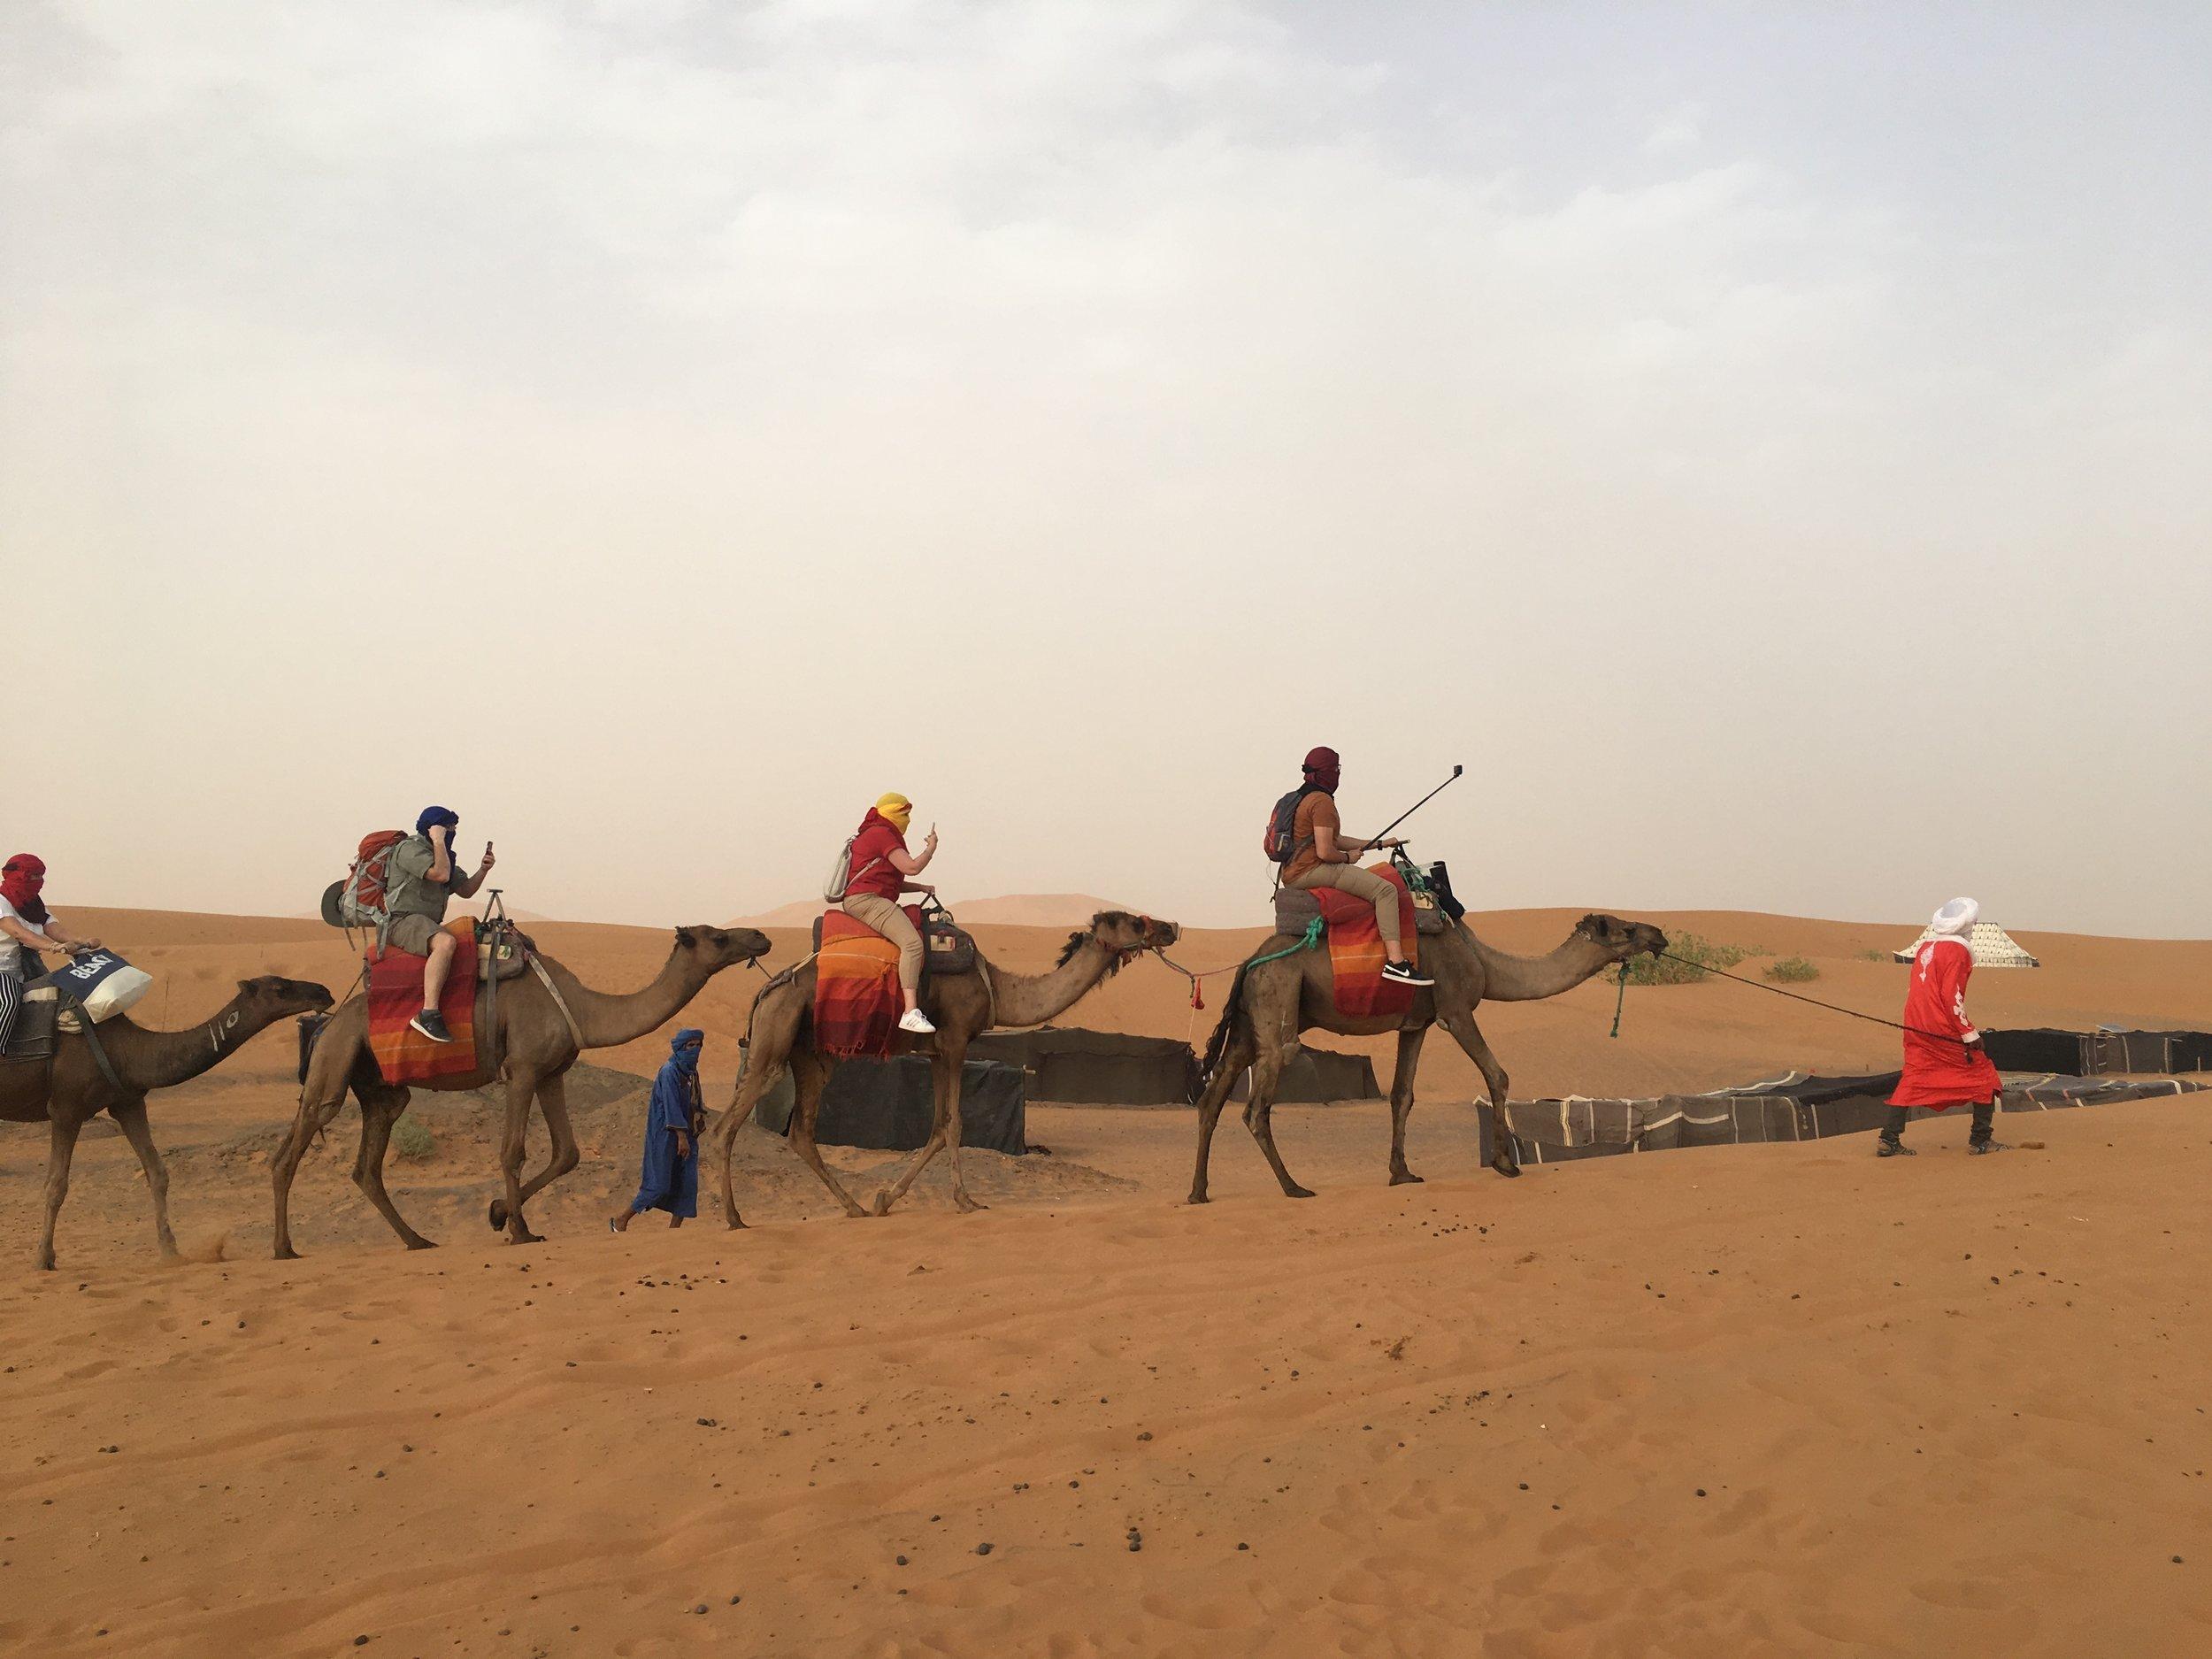 A camel shepherd leads his animals across the Erg Chebbii Dunes.